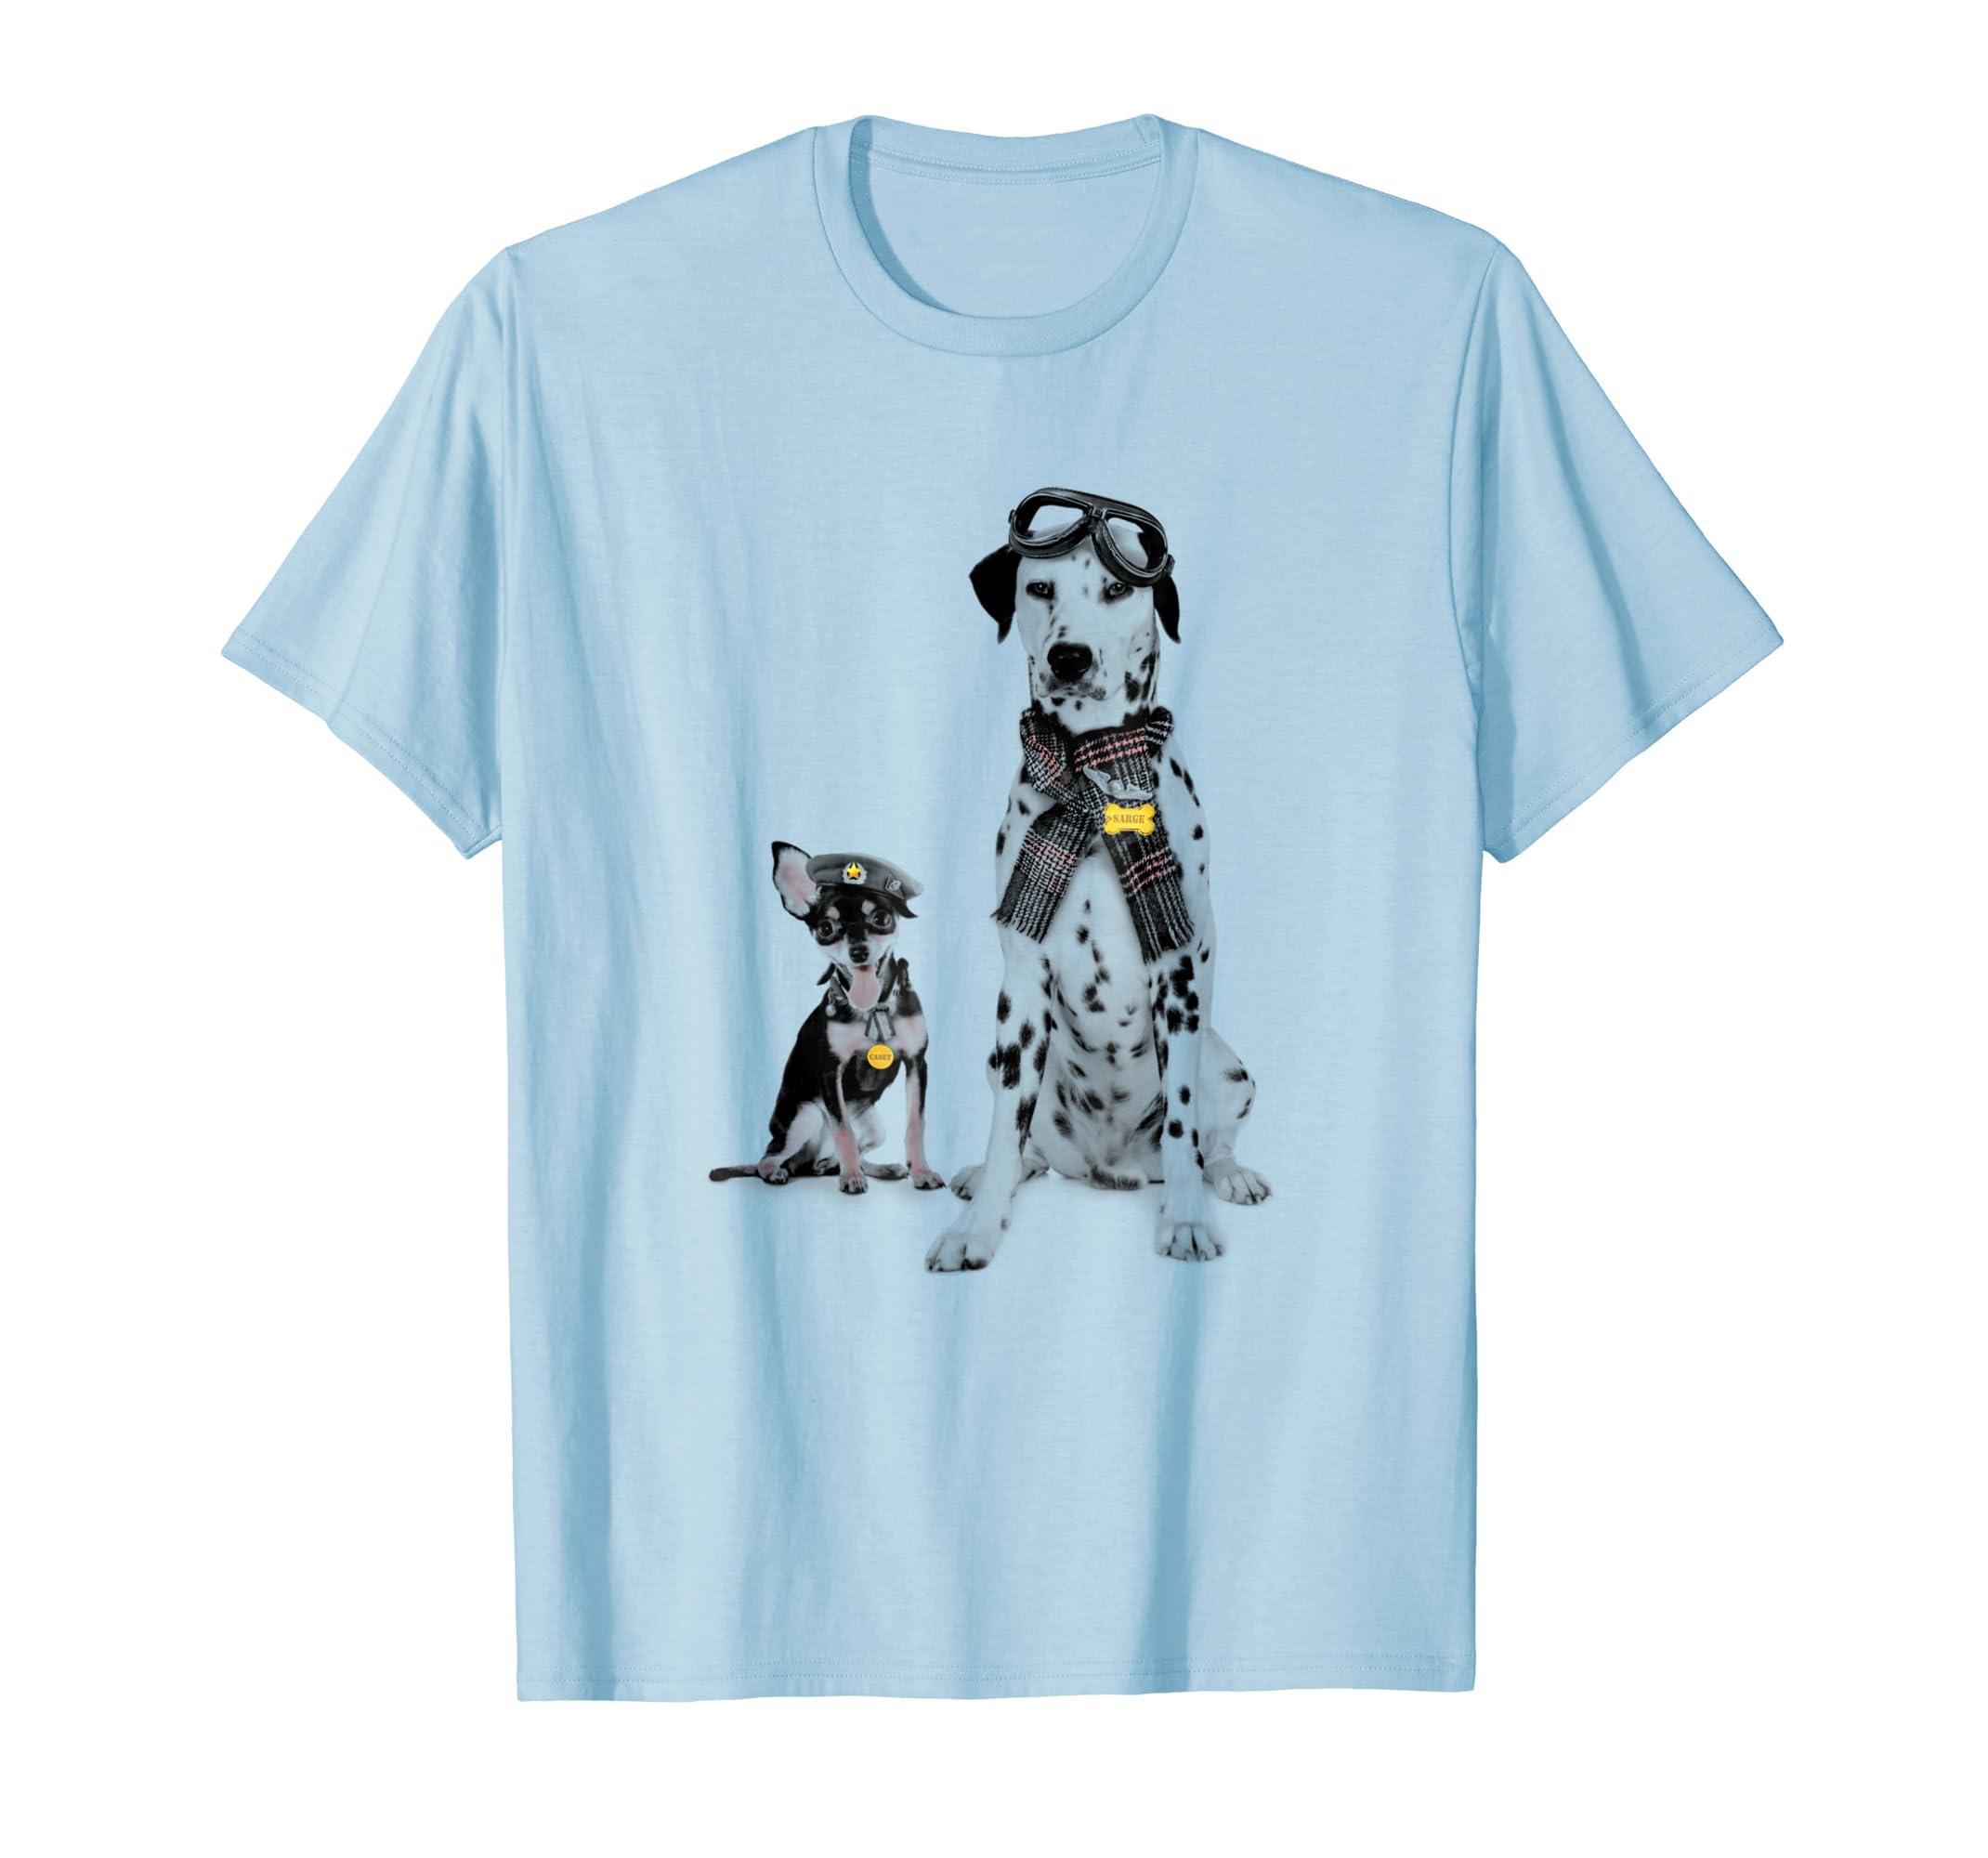 Funny Dog Shirt - Cute Pilot Dogs Flying Squad T-Shirt-AZP